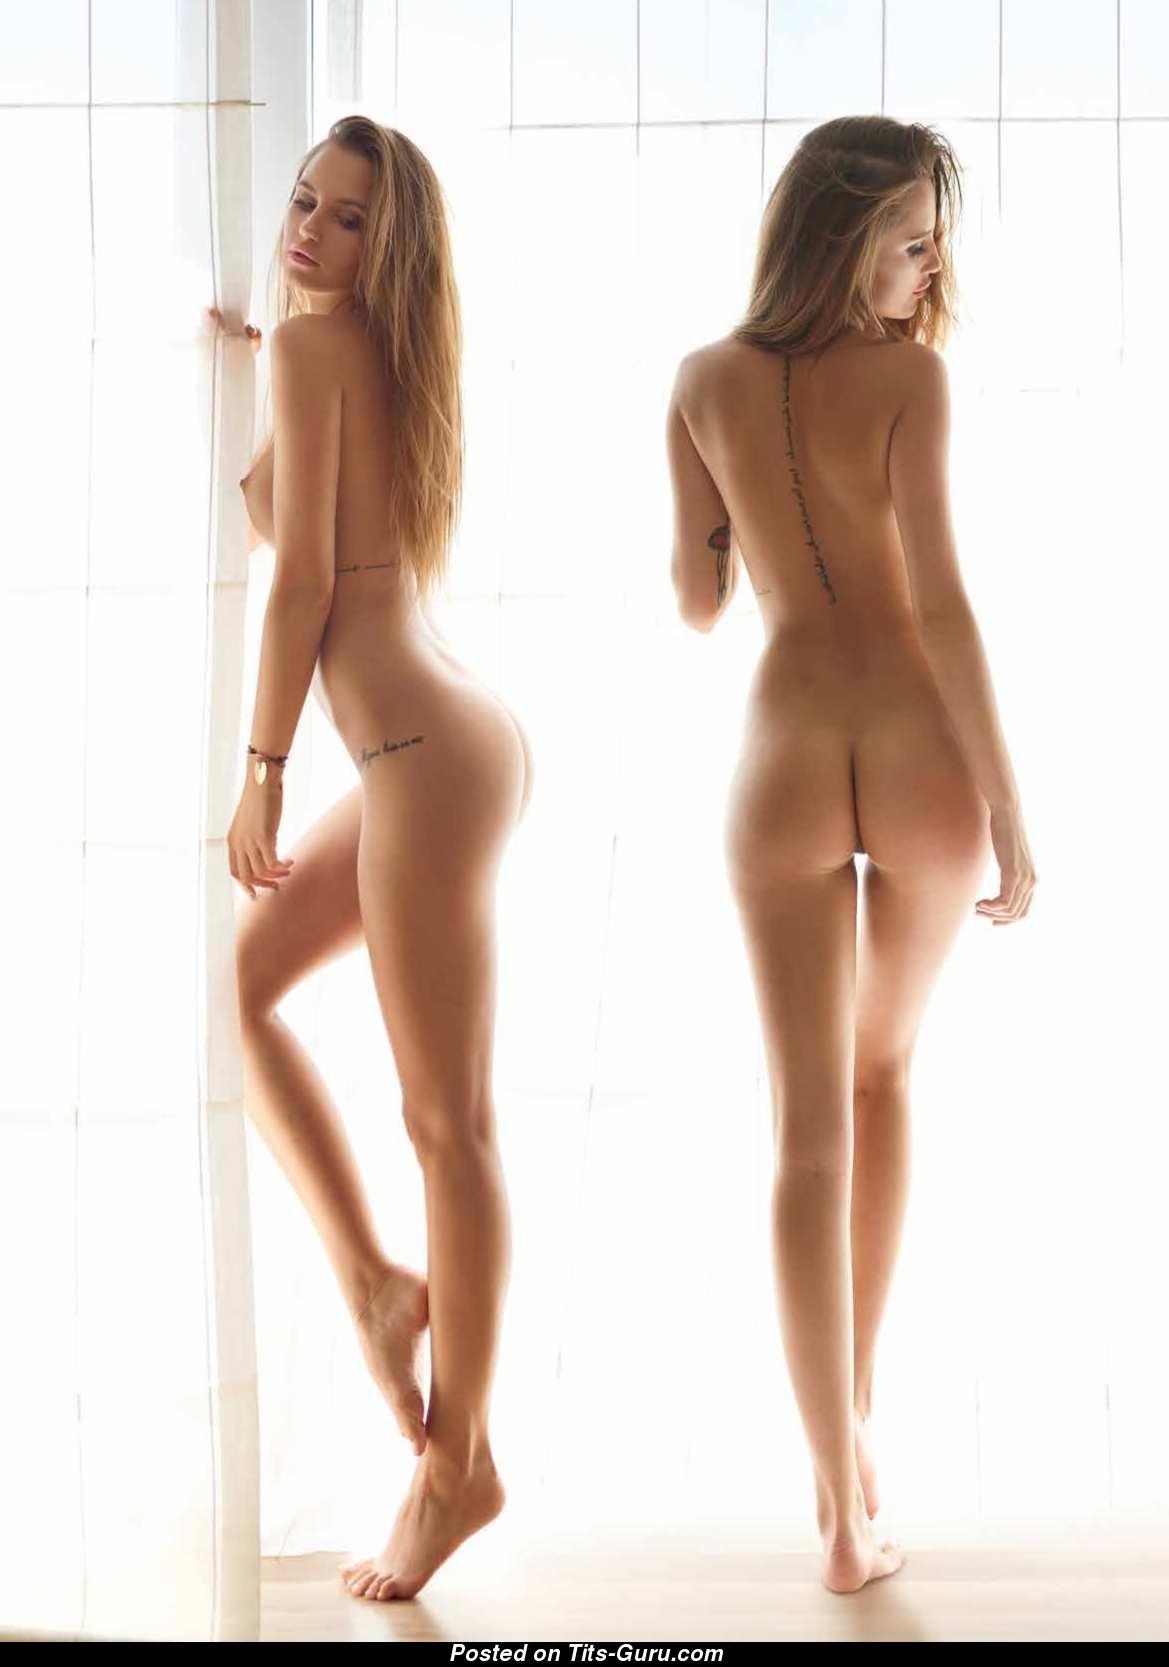 Paulina Mikolajczak - Blonde Babe With Naked Real Small Boobies -1140